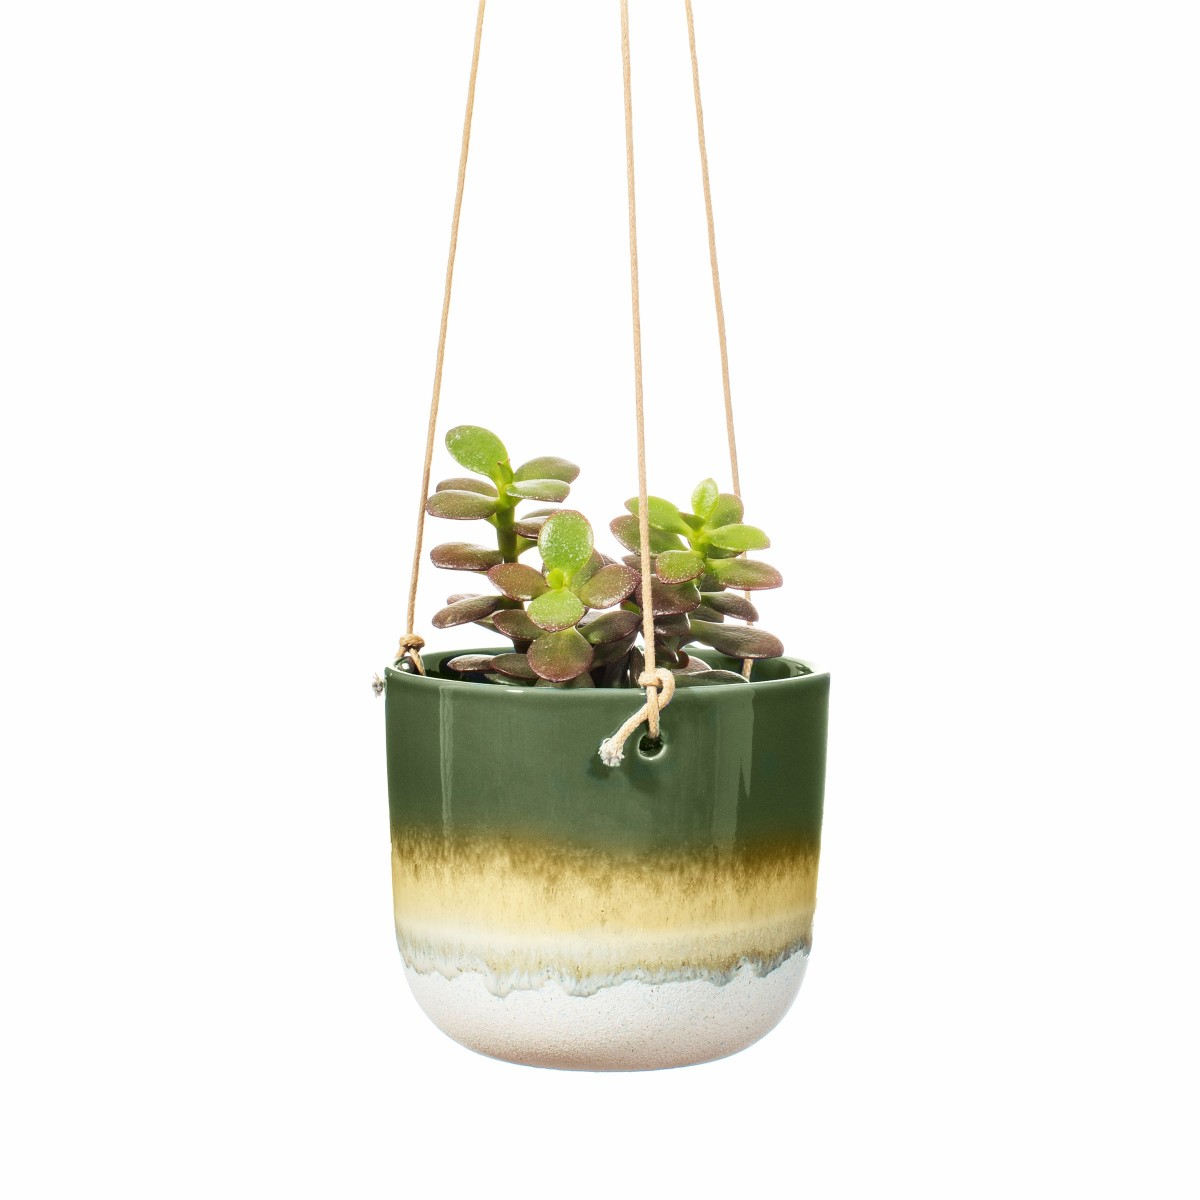 Plantenkamer-mojave-green-hanging-planter